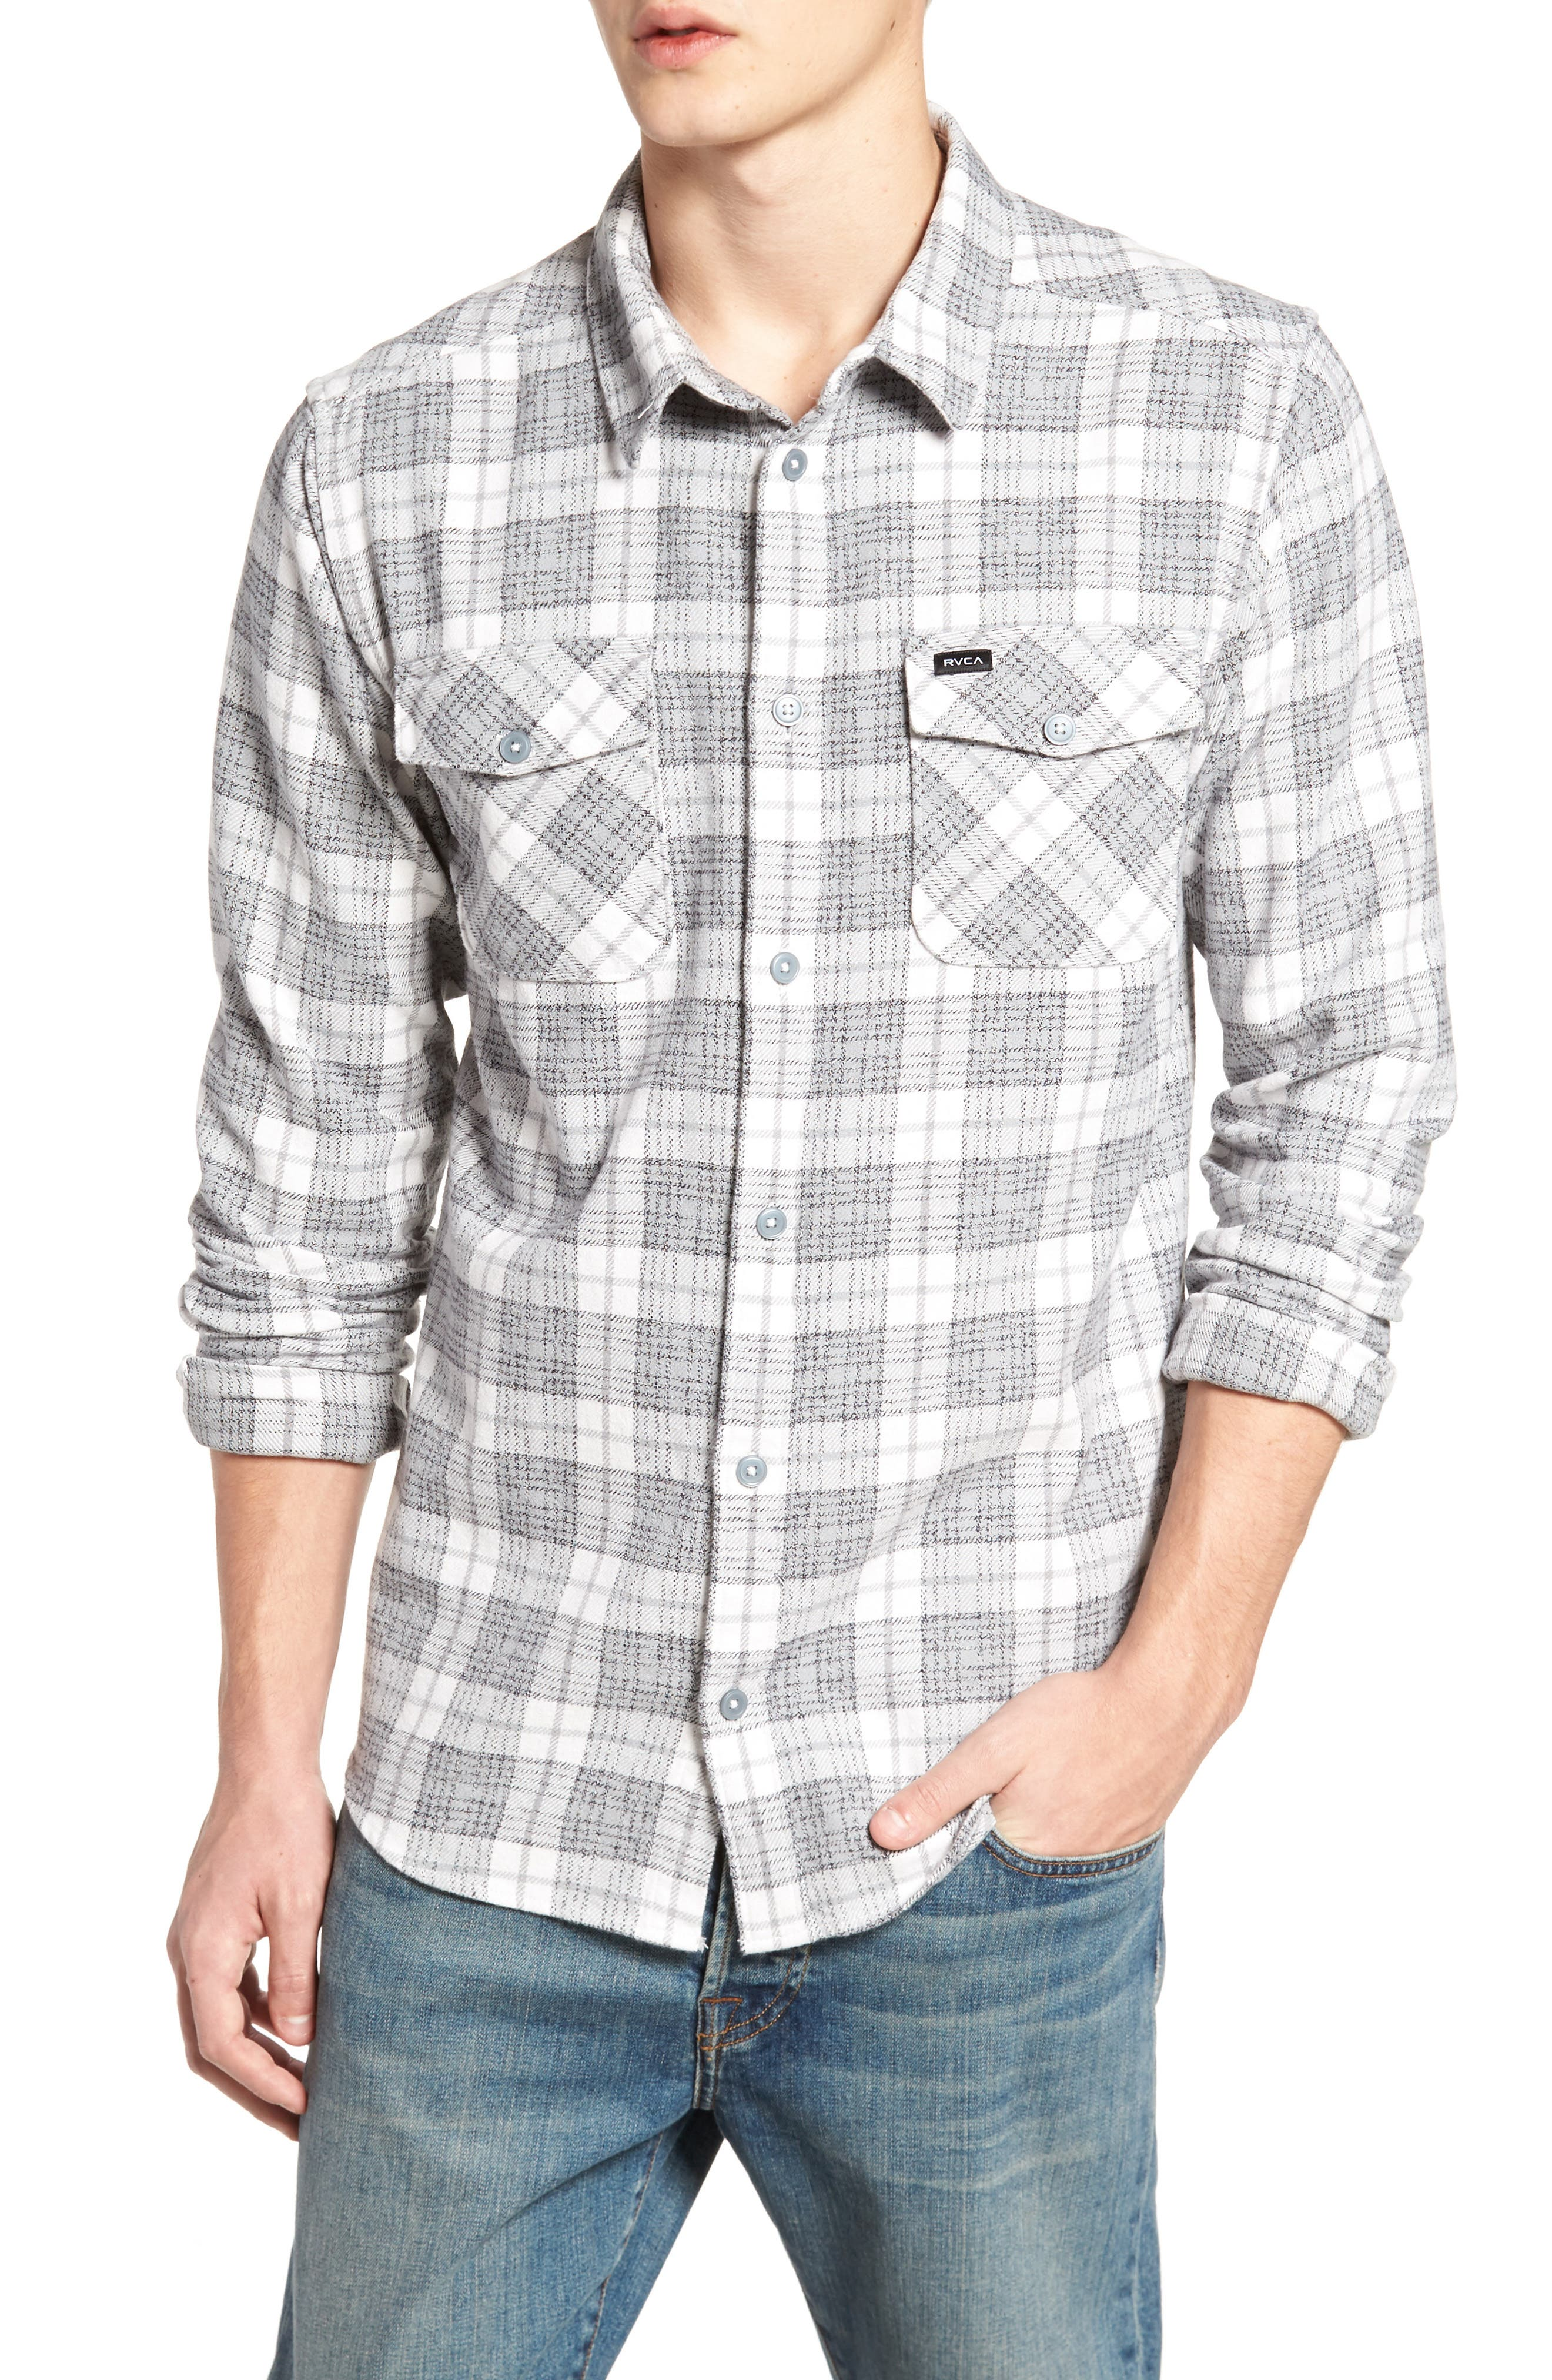 'That'll Work' Trim Fit Plaid Flannel Shirt,                             Main thumbnail 1, color,                             ANTIQUE WHITE